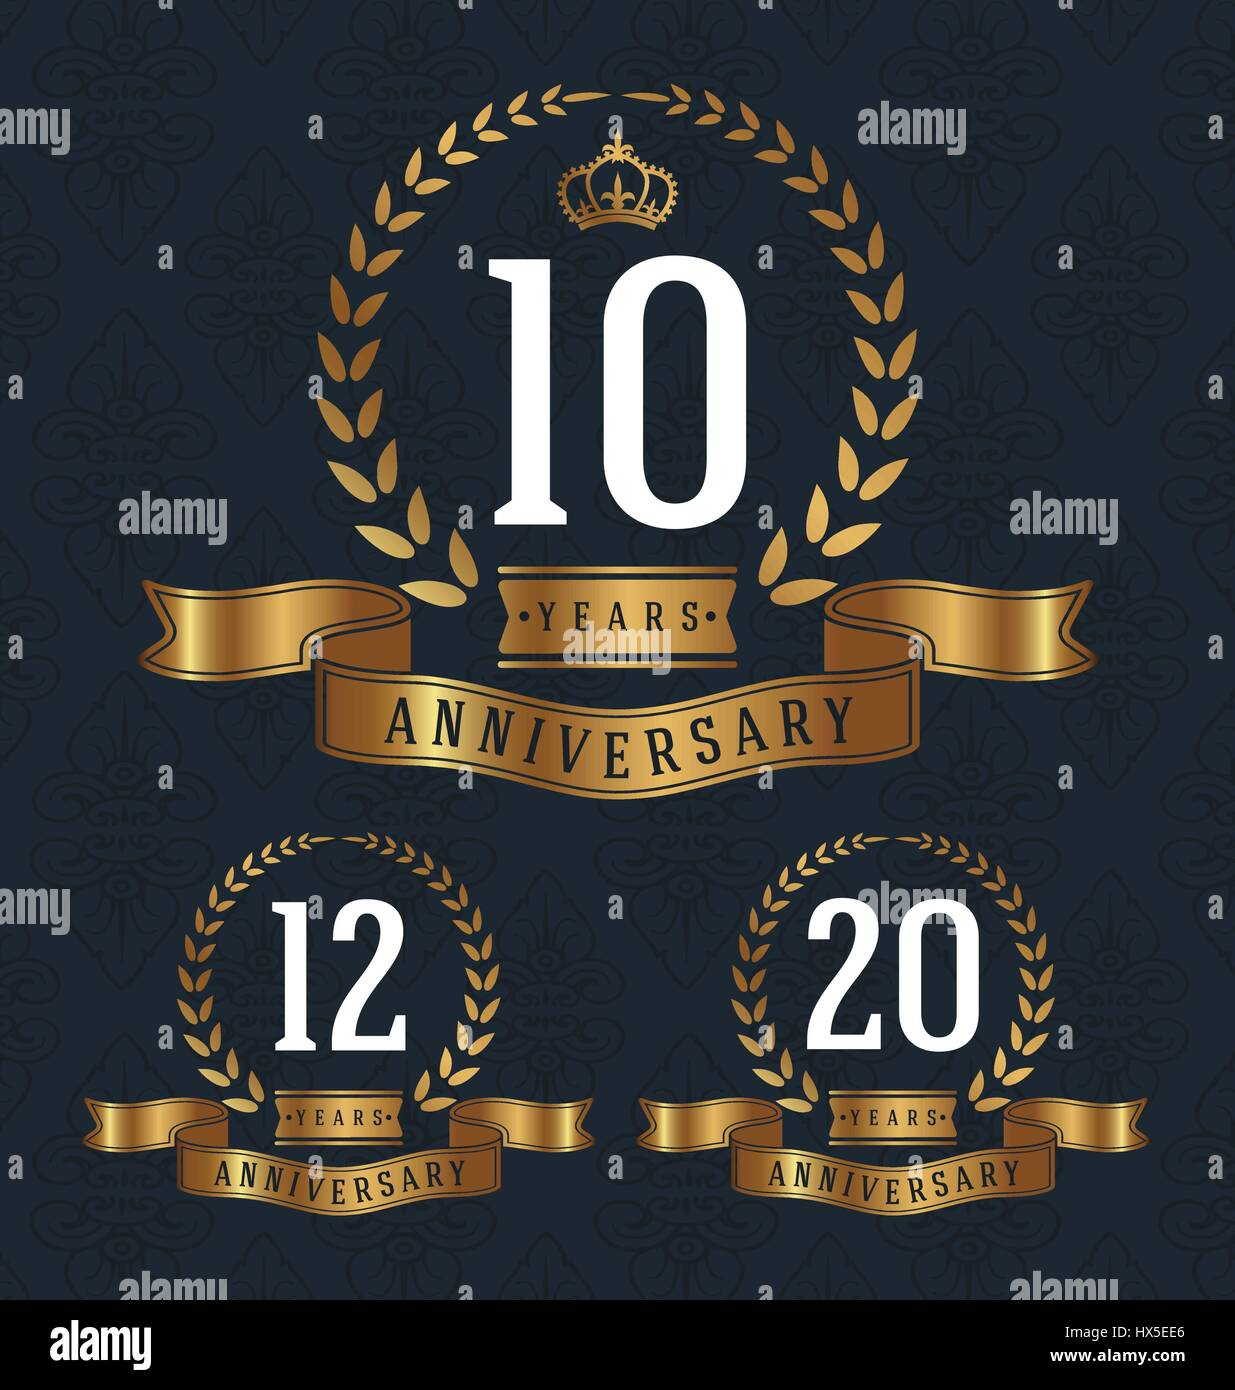 10,12,20 Years Anniversary decorative sign. Vector illustration - Stock Vector